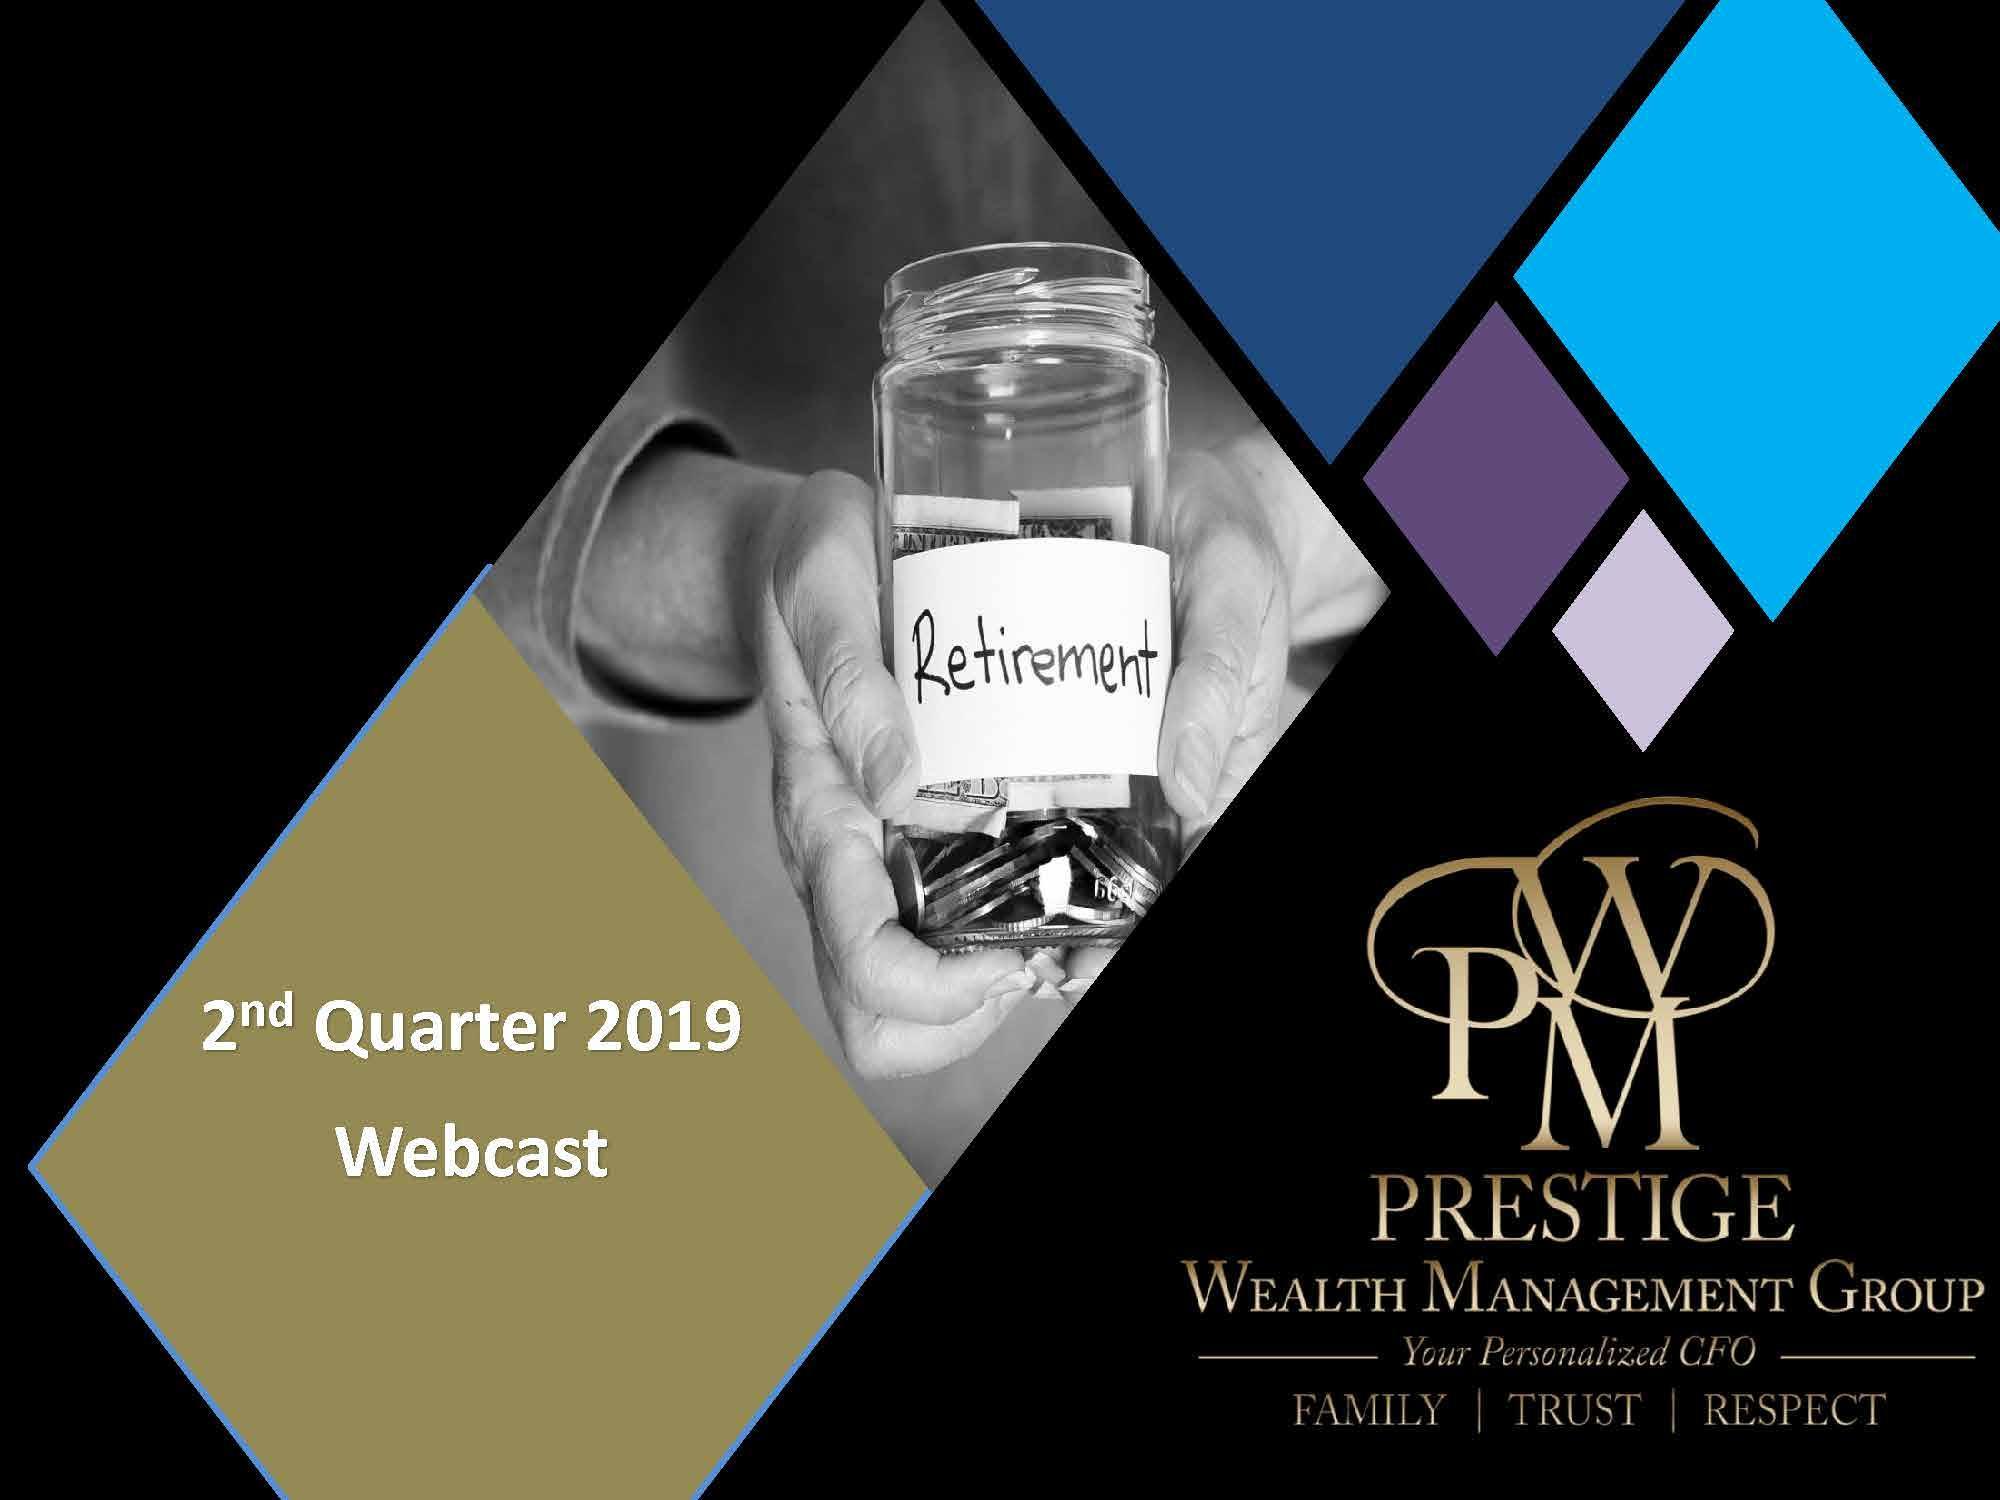 Webcast - 2nd Quarter 2019 Thumbnail